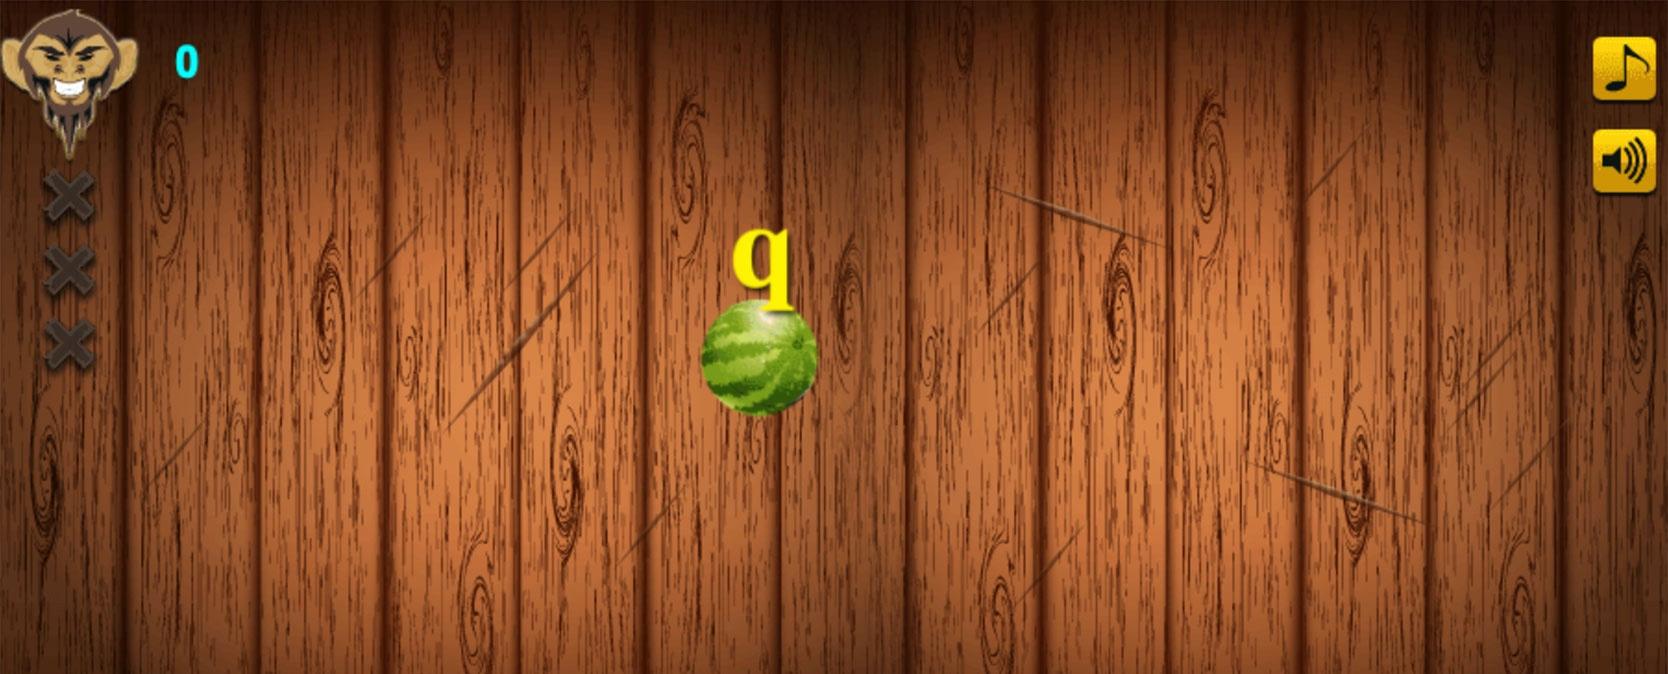 screenshot of keyboard ninja game